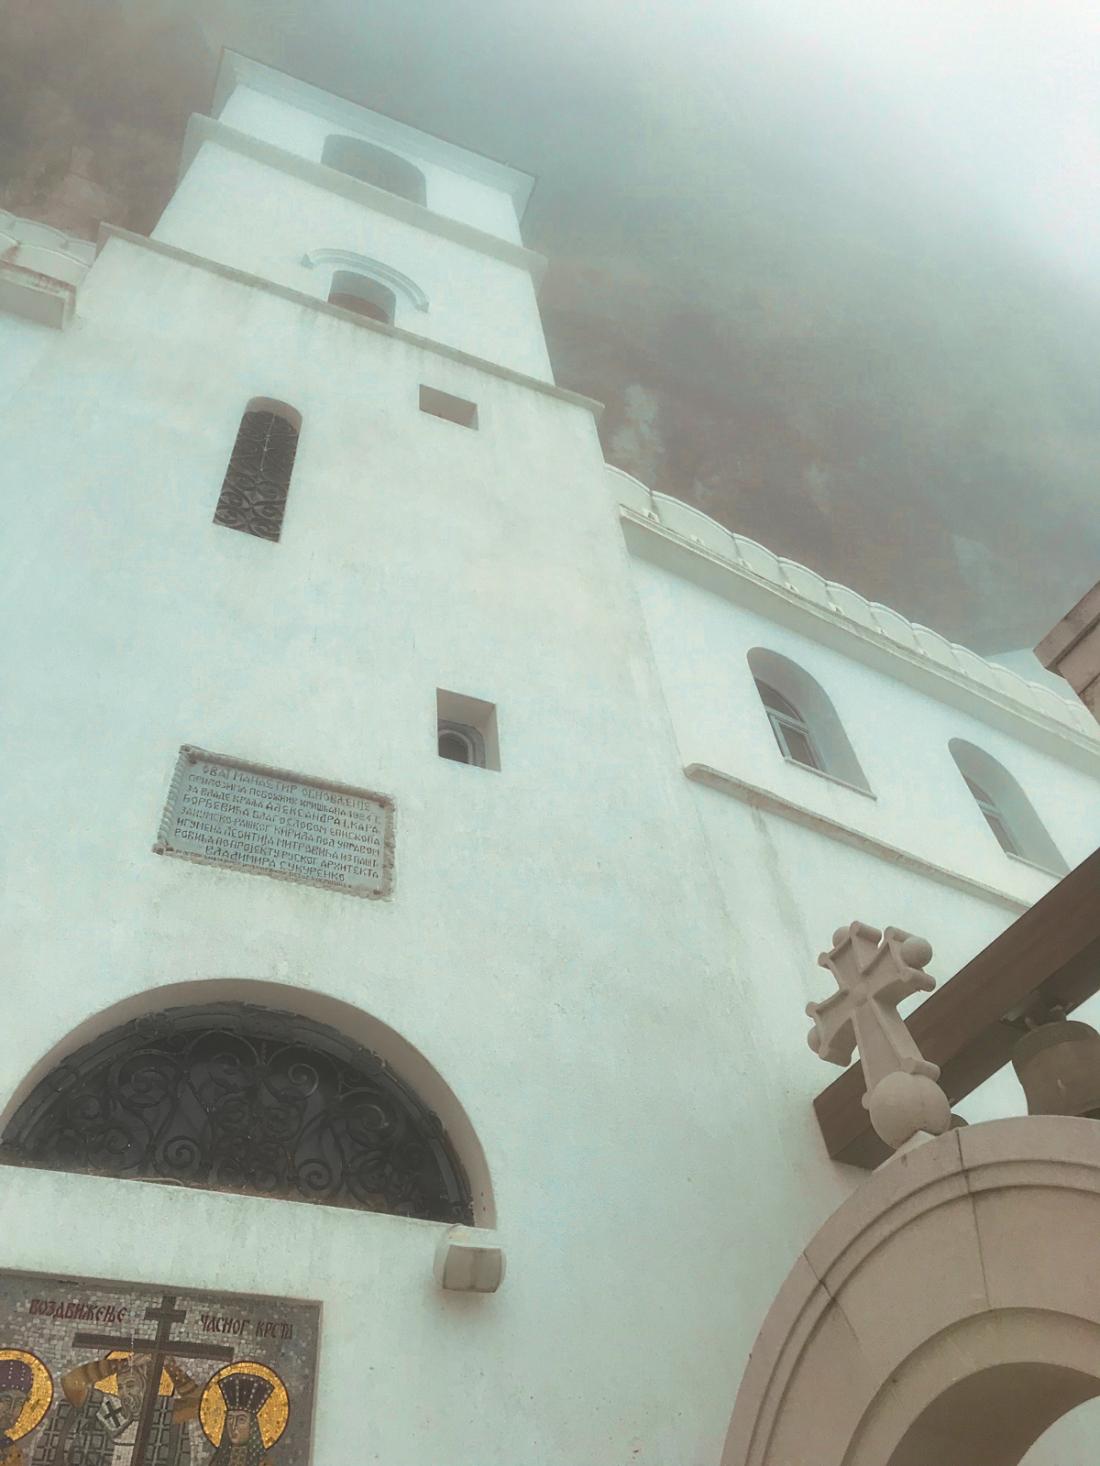 ostrog_monastery_(c)_hazal_sahin_hazalishere_wordpress_com.jpg